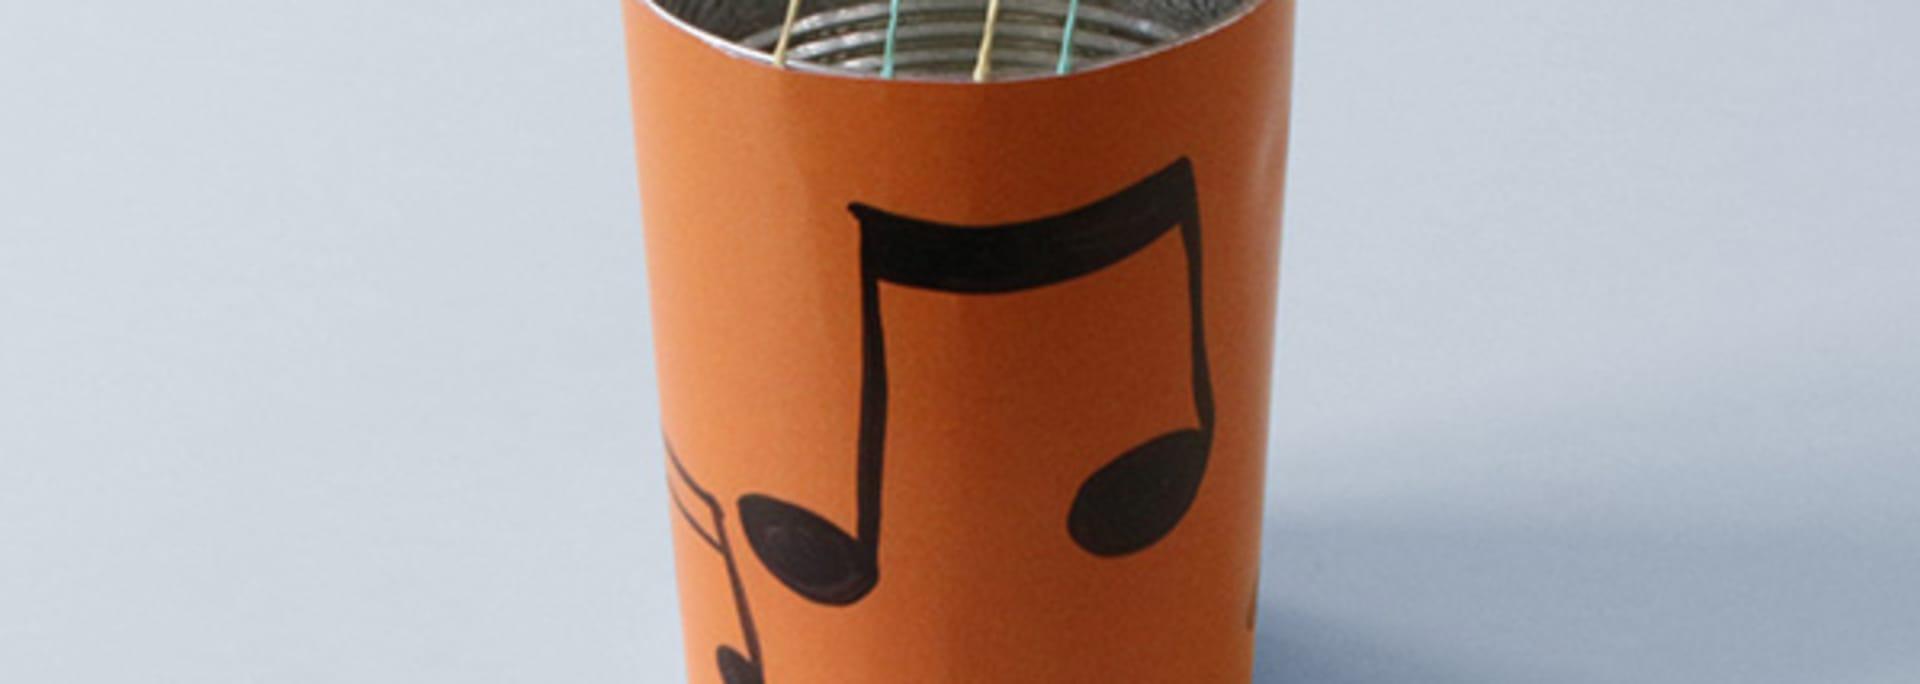 Büchsengitarre (Upcycling)